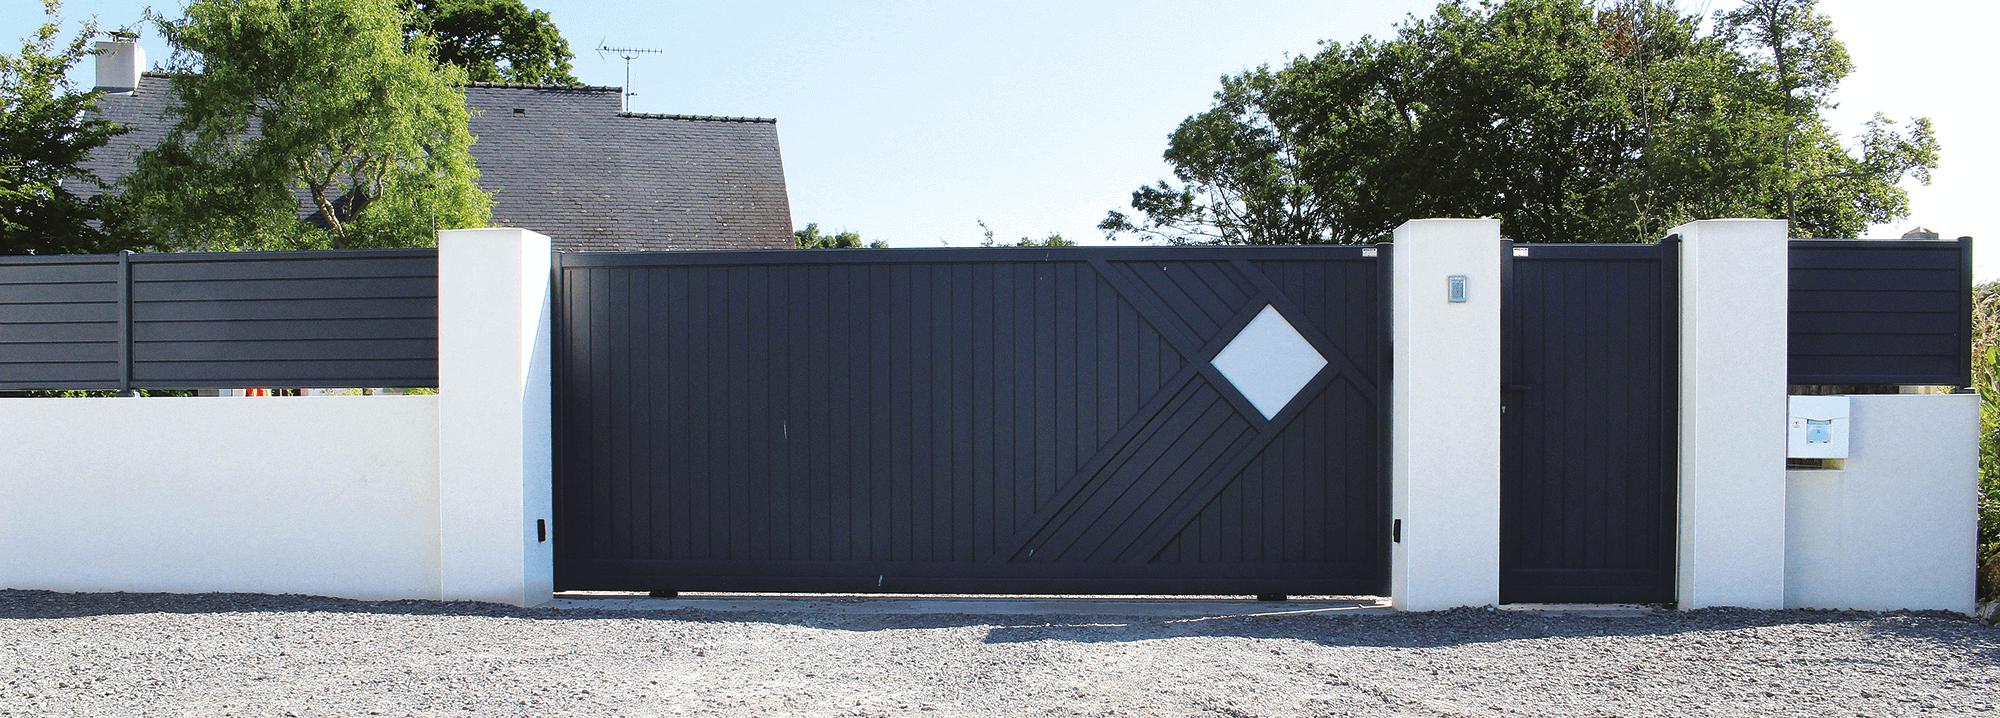 portail aluminium zouk les mod les contemporains charuel. Black Bedroom Furniture Sets. Home Design Ideas